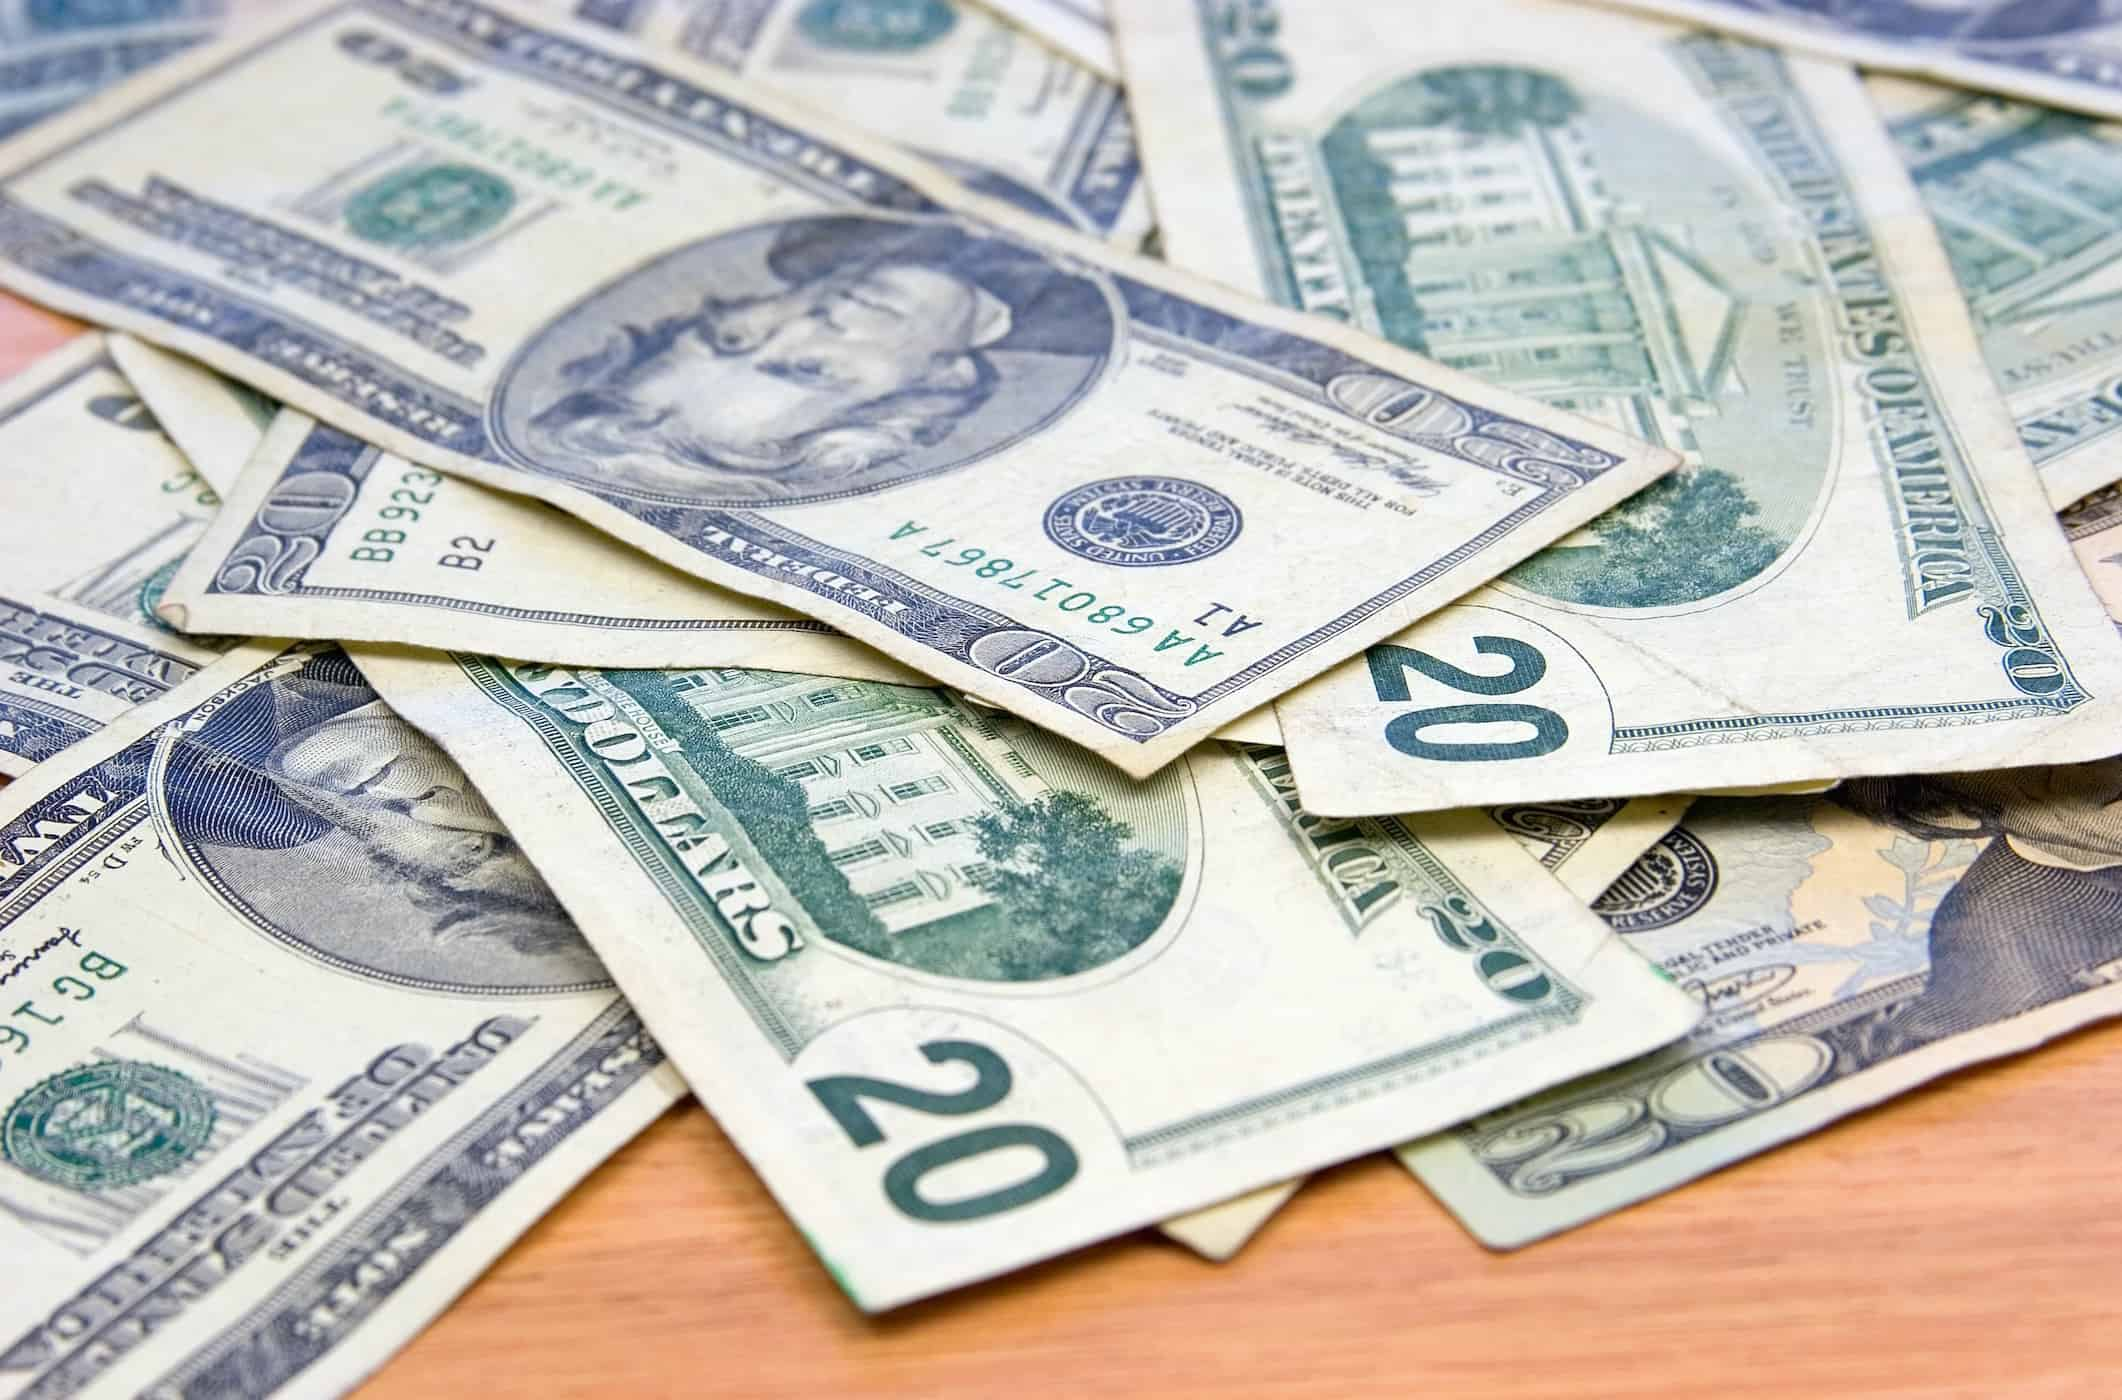 Money - freelance earnings